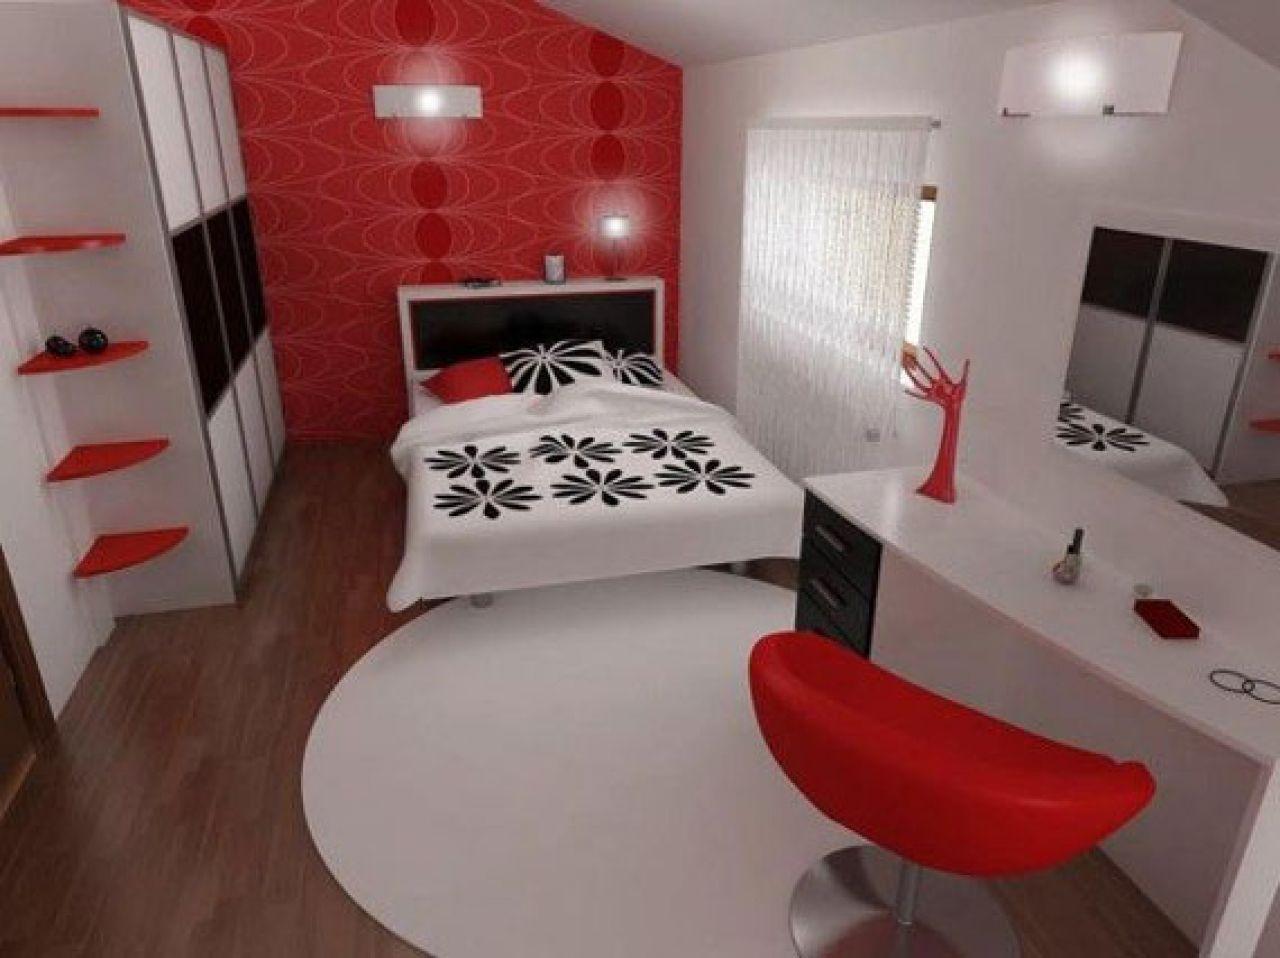 Bedroom Ideas For White Attic Bedroom House Design Decor Interior Kootation Terrific Excellent Attic White Bedroom Decor Red Bedroom Walls Black Walls Bedroom